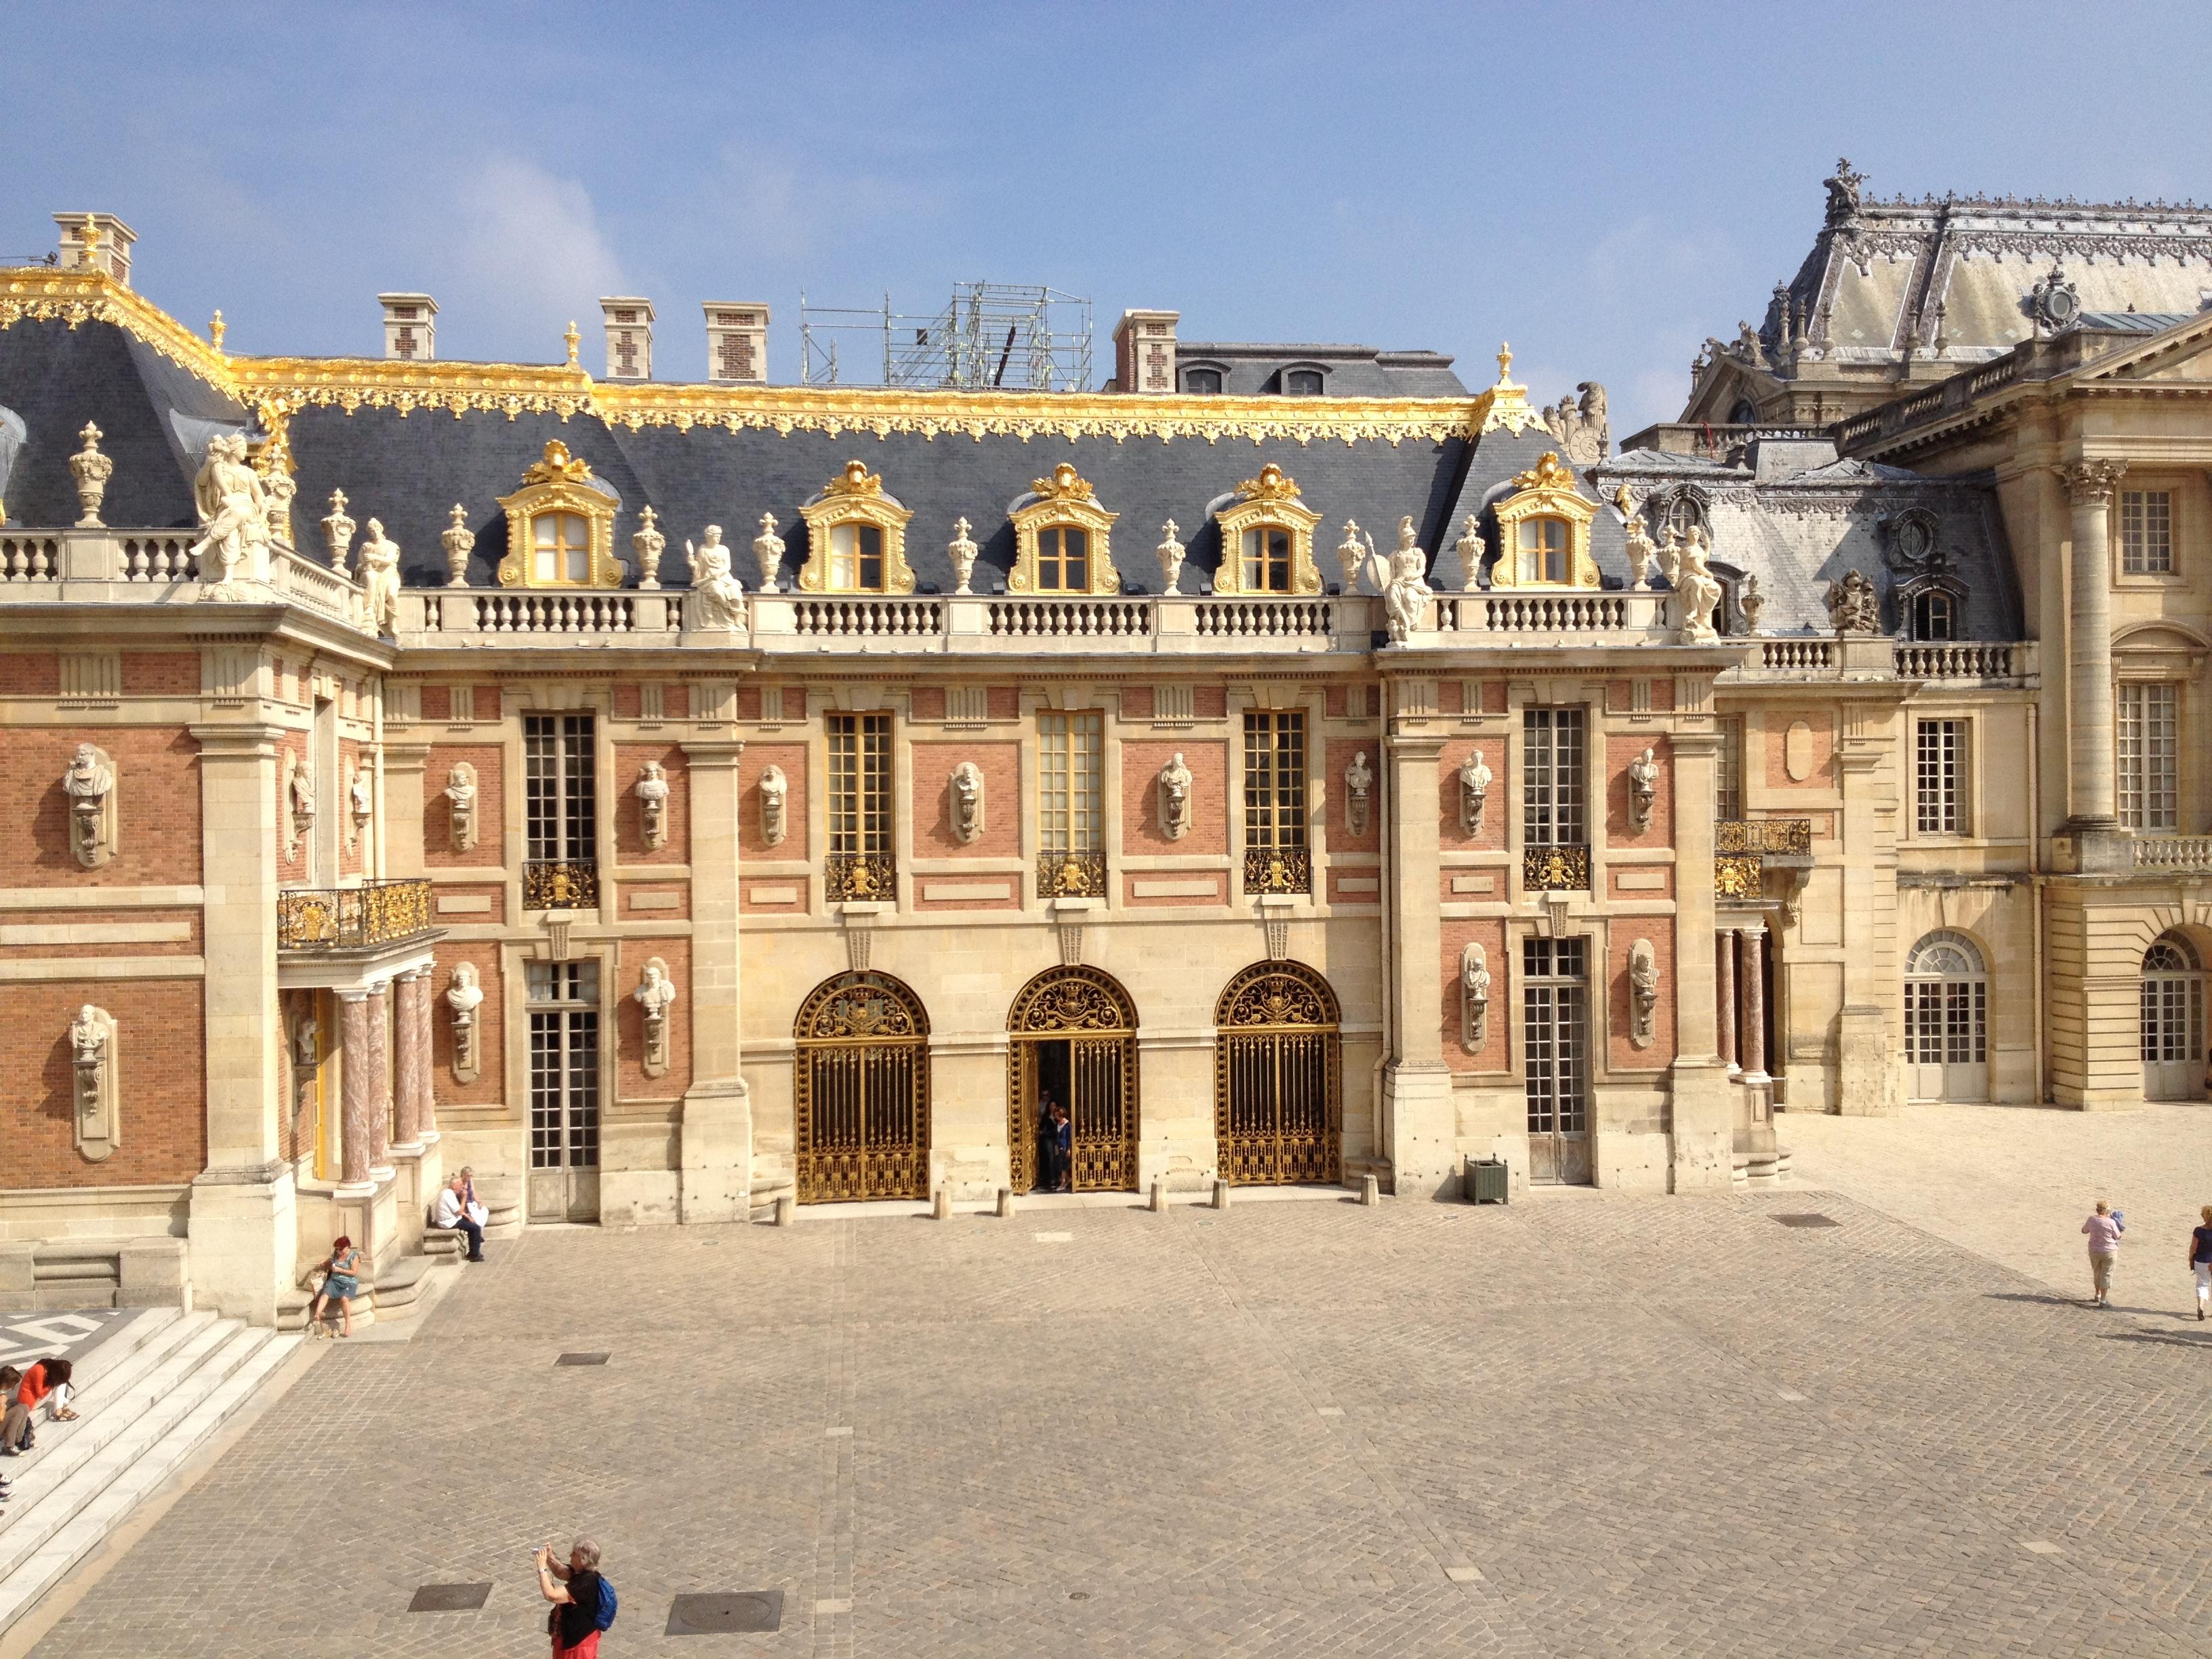 Chateau de versailles annsflair - Photo chateau de versailles ...